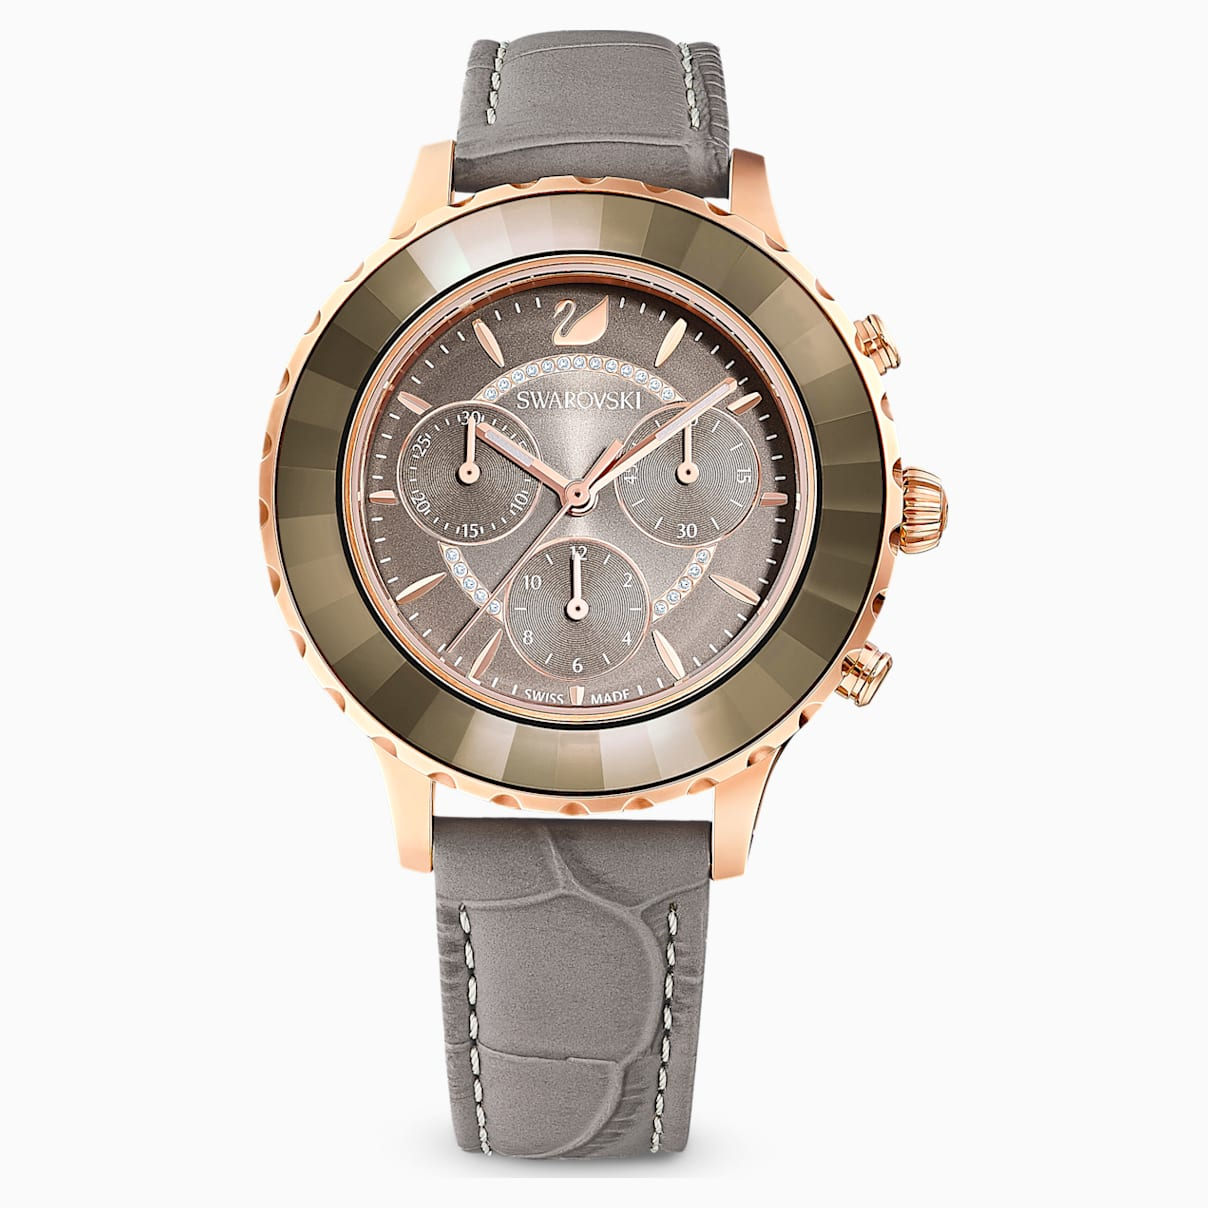 Swarovski Octea Lux Chrono Watch, Leather Strap, Gray, Rose-gold tone PVD